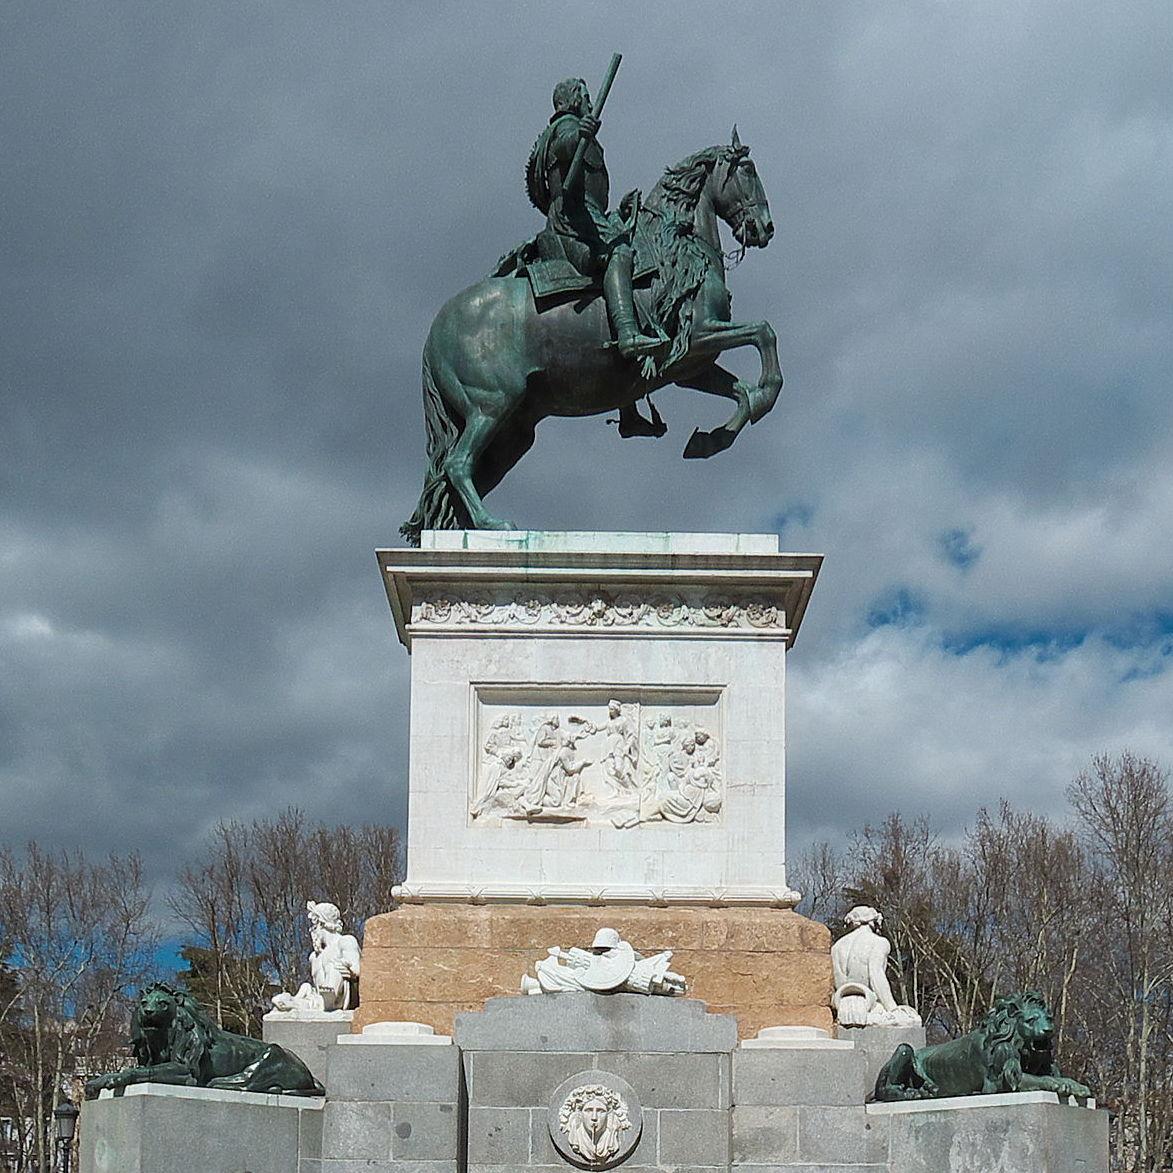 La estatua ecuestre de Felipe IV por Pietro Tacca (II): De emblema político a obra de arte